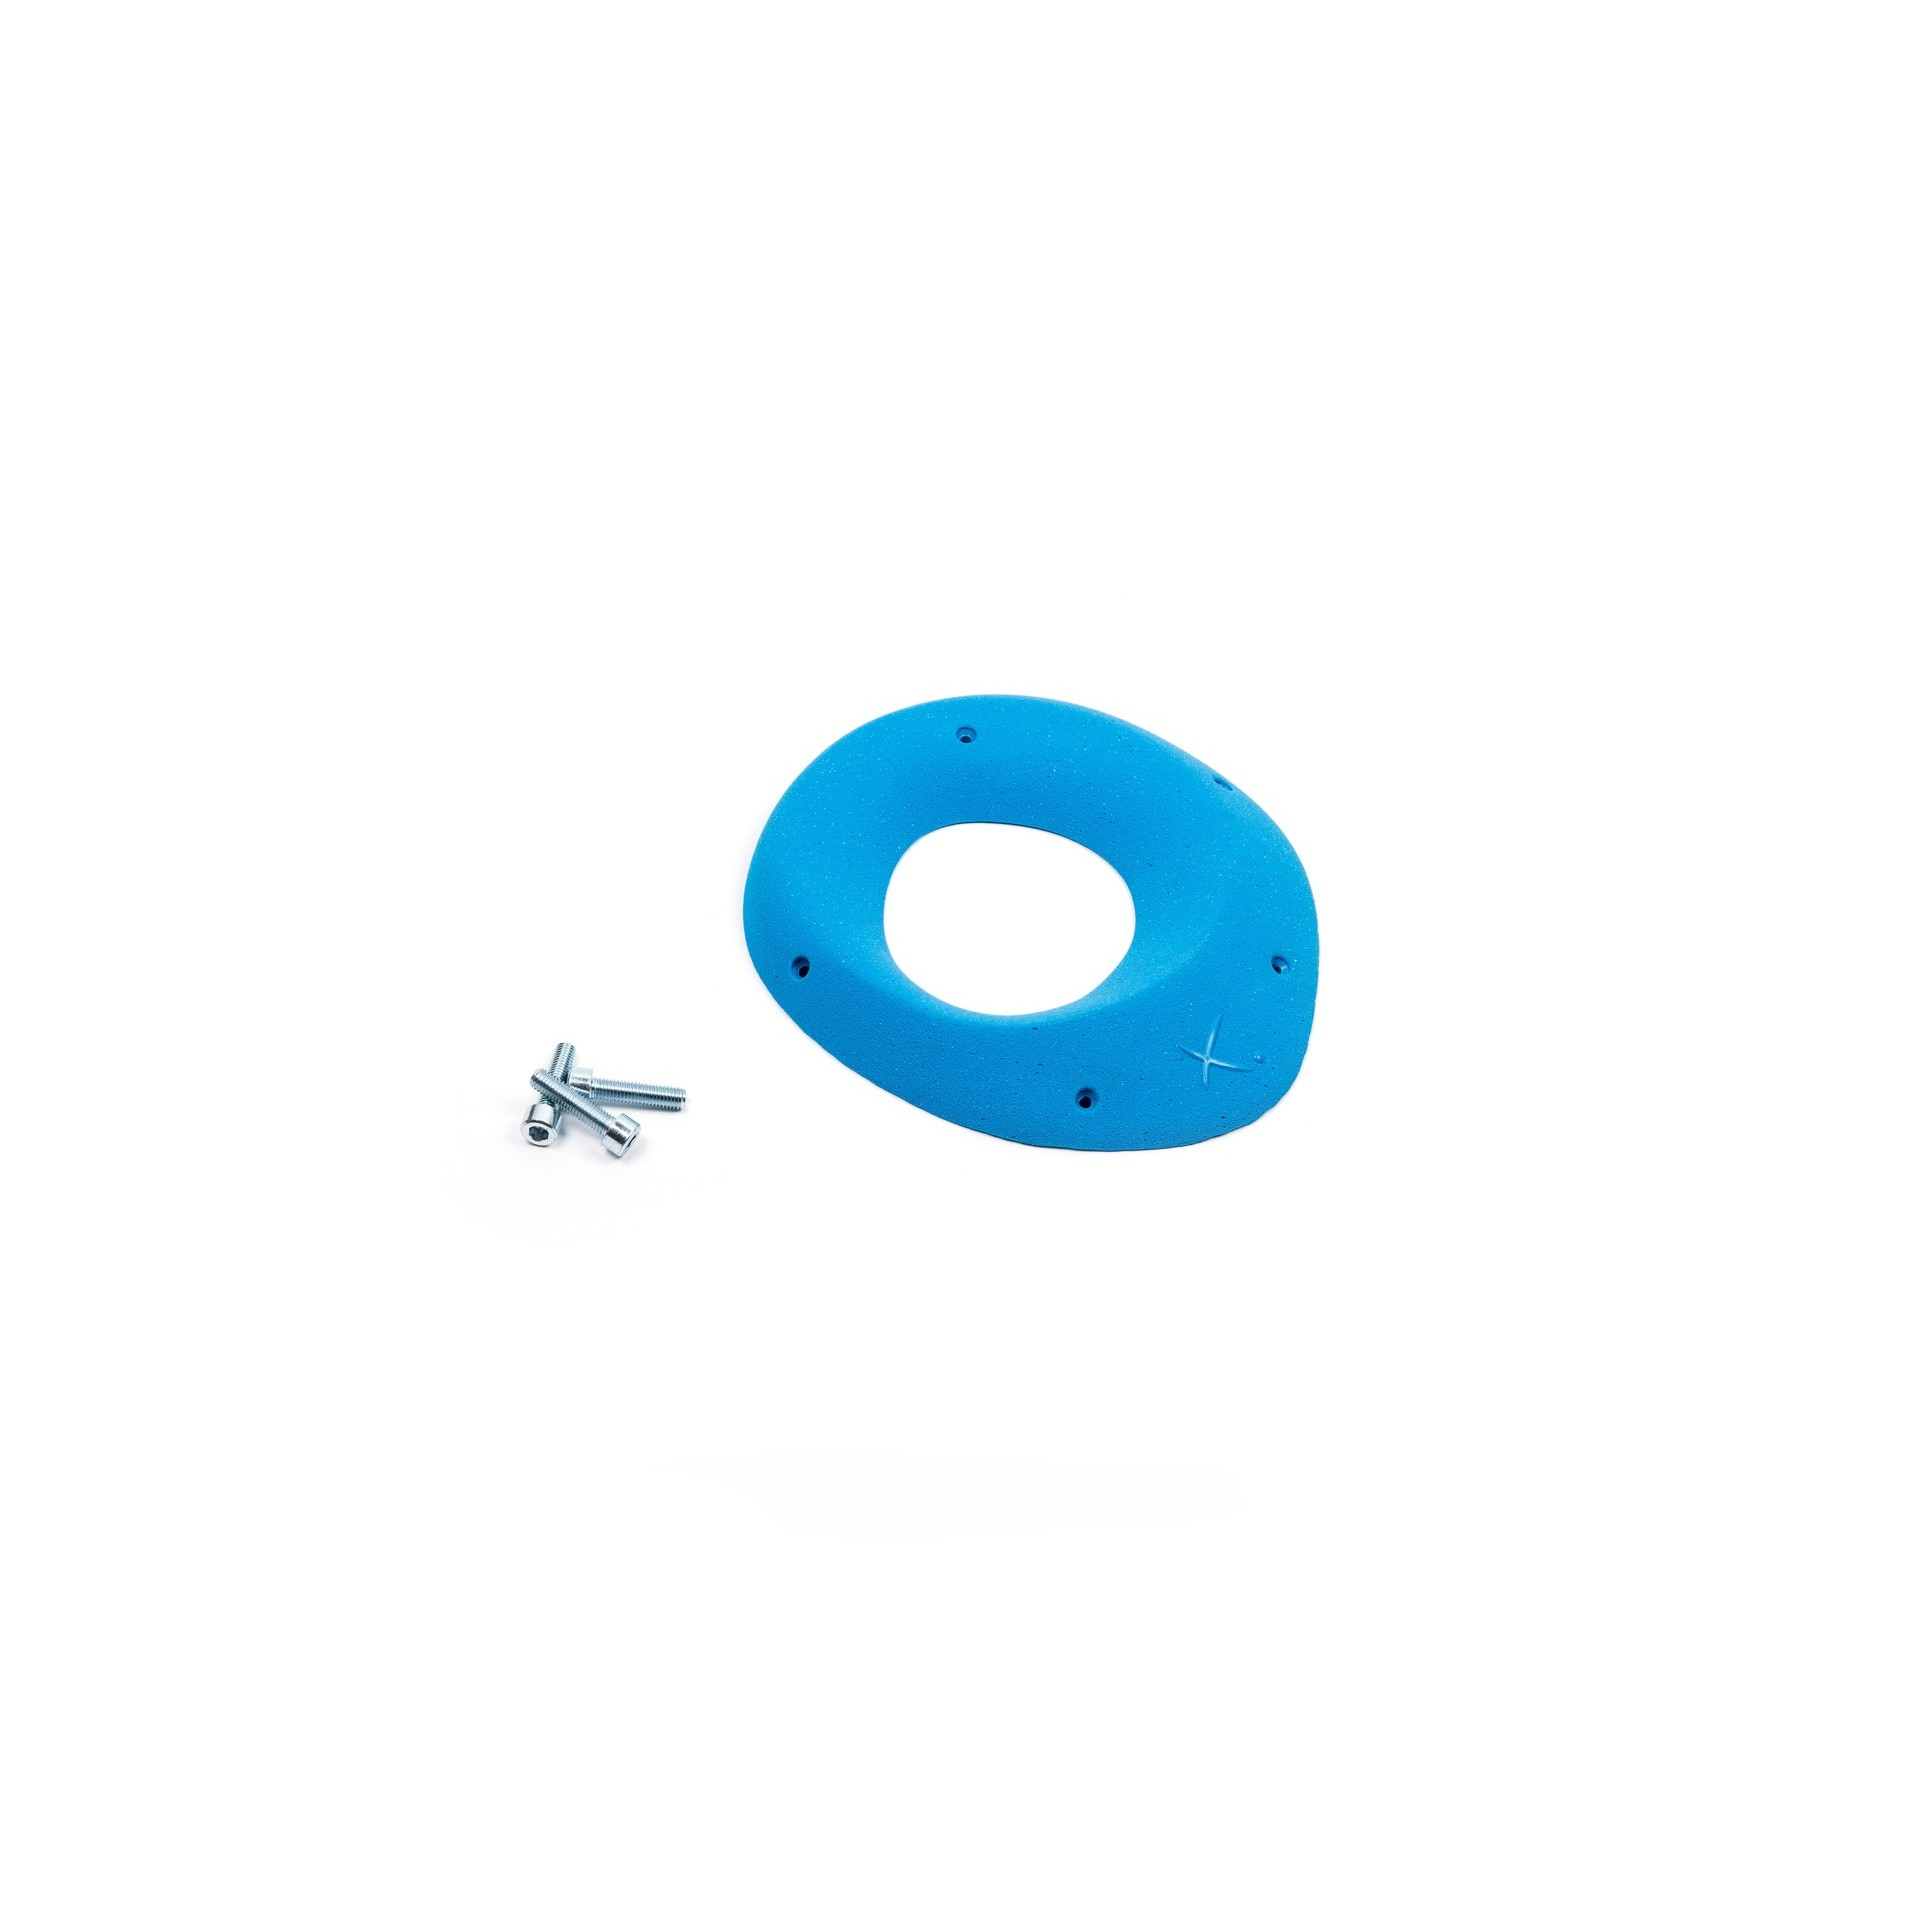 Romain Desgranges - Black Hole 1 (PU) - Holds.fr